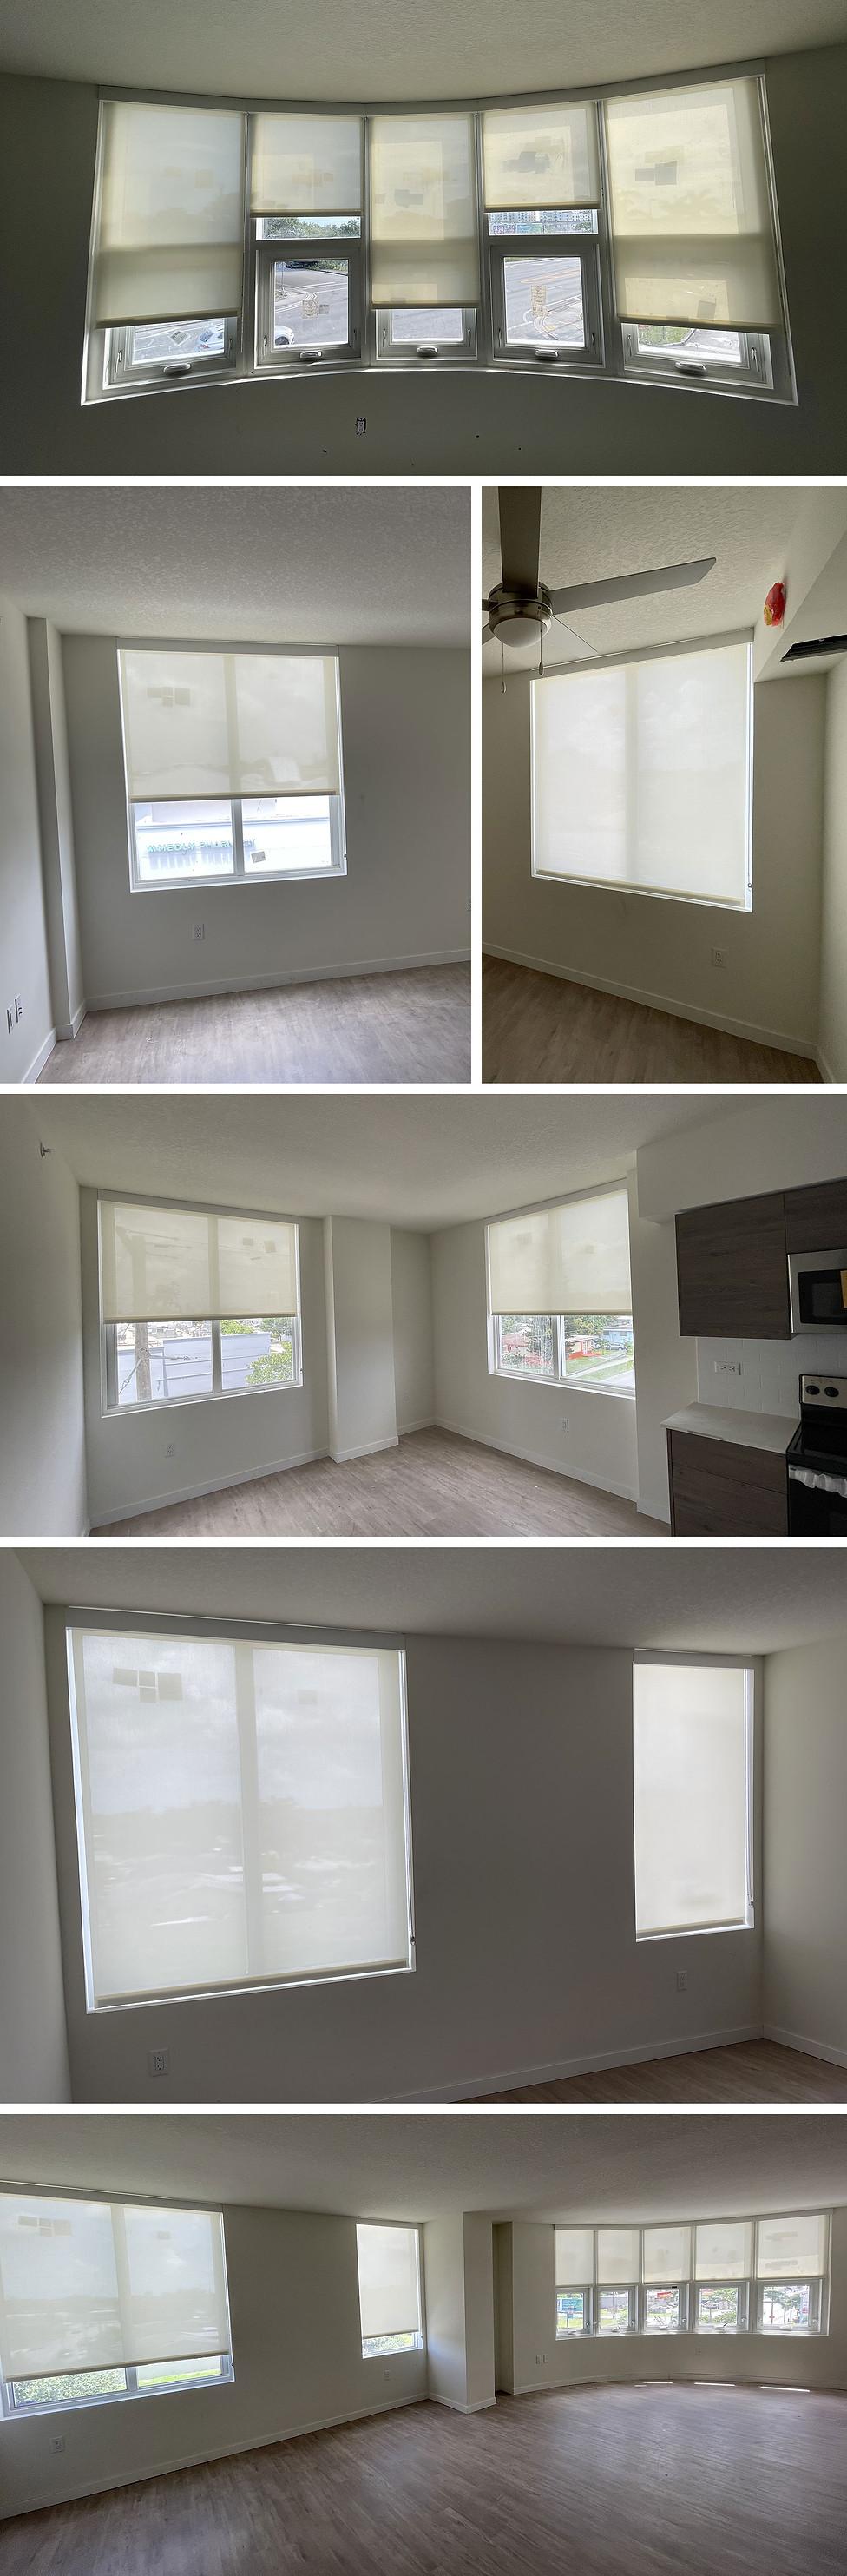 las-brisas-miami-window-shade-blinds.jpg